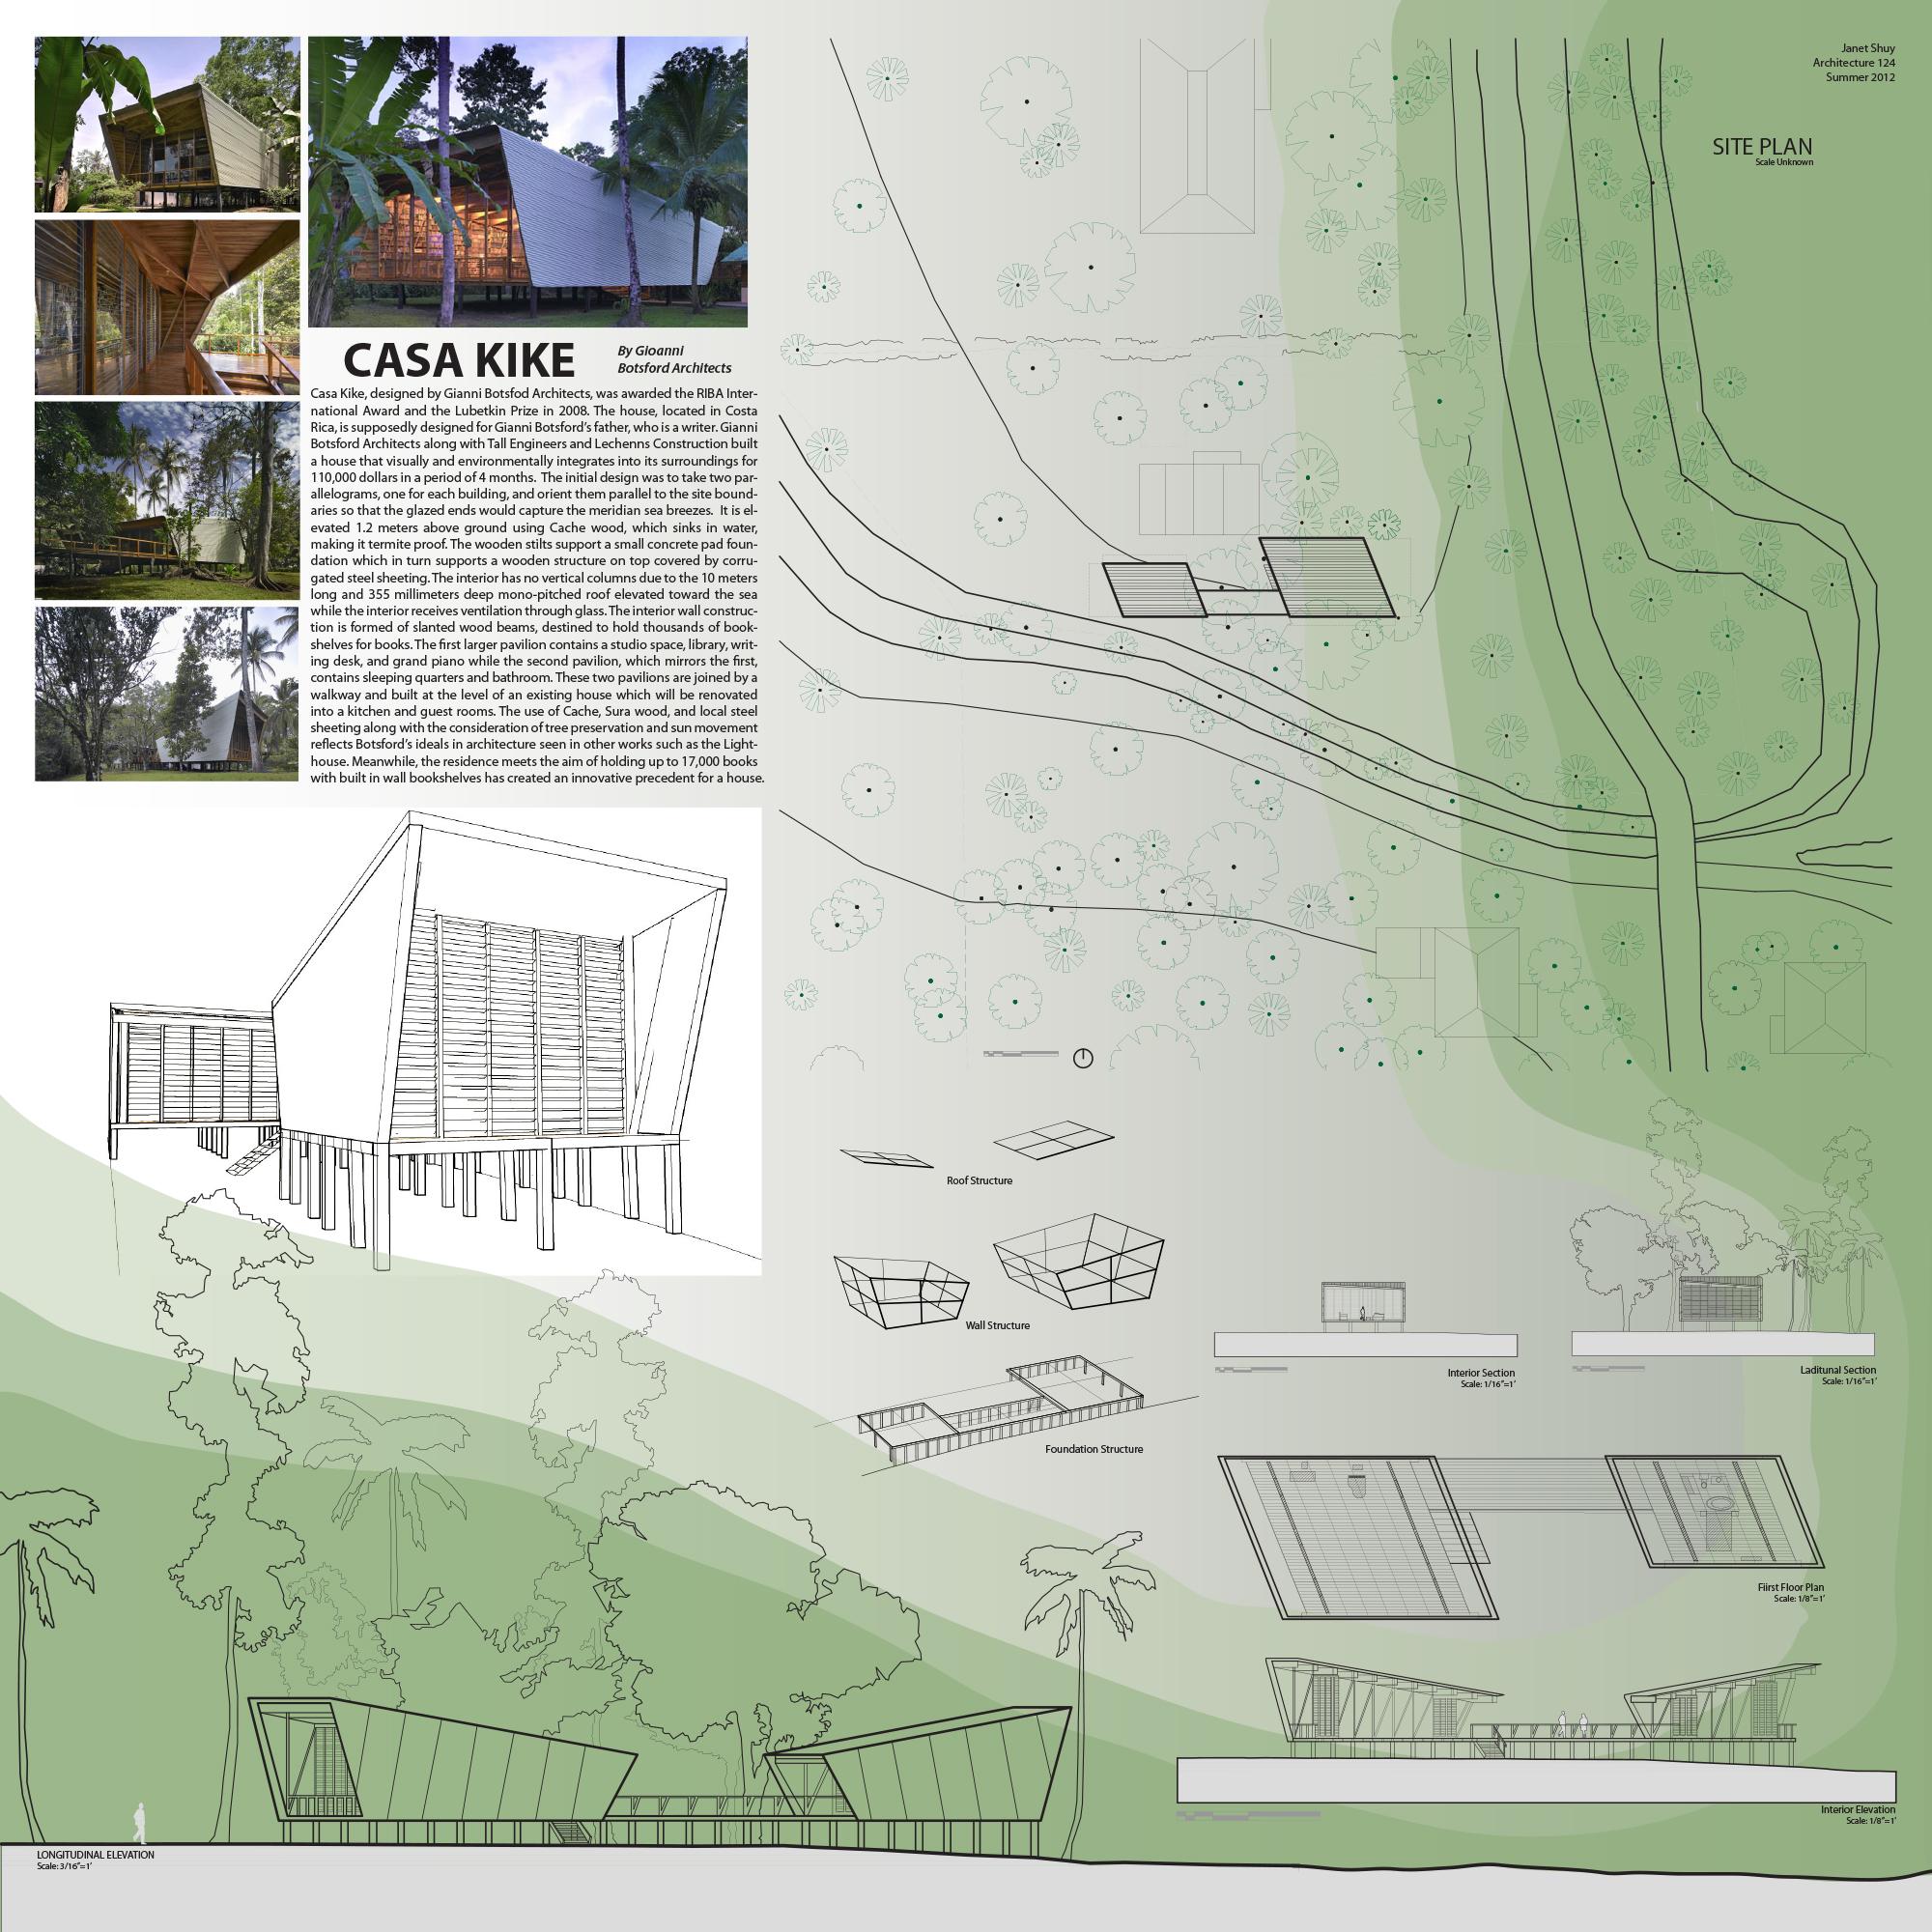 Casa Kike, Gianni Botsford Architects, Janet Shuy, Arch 124A, UC Berkeley